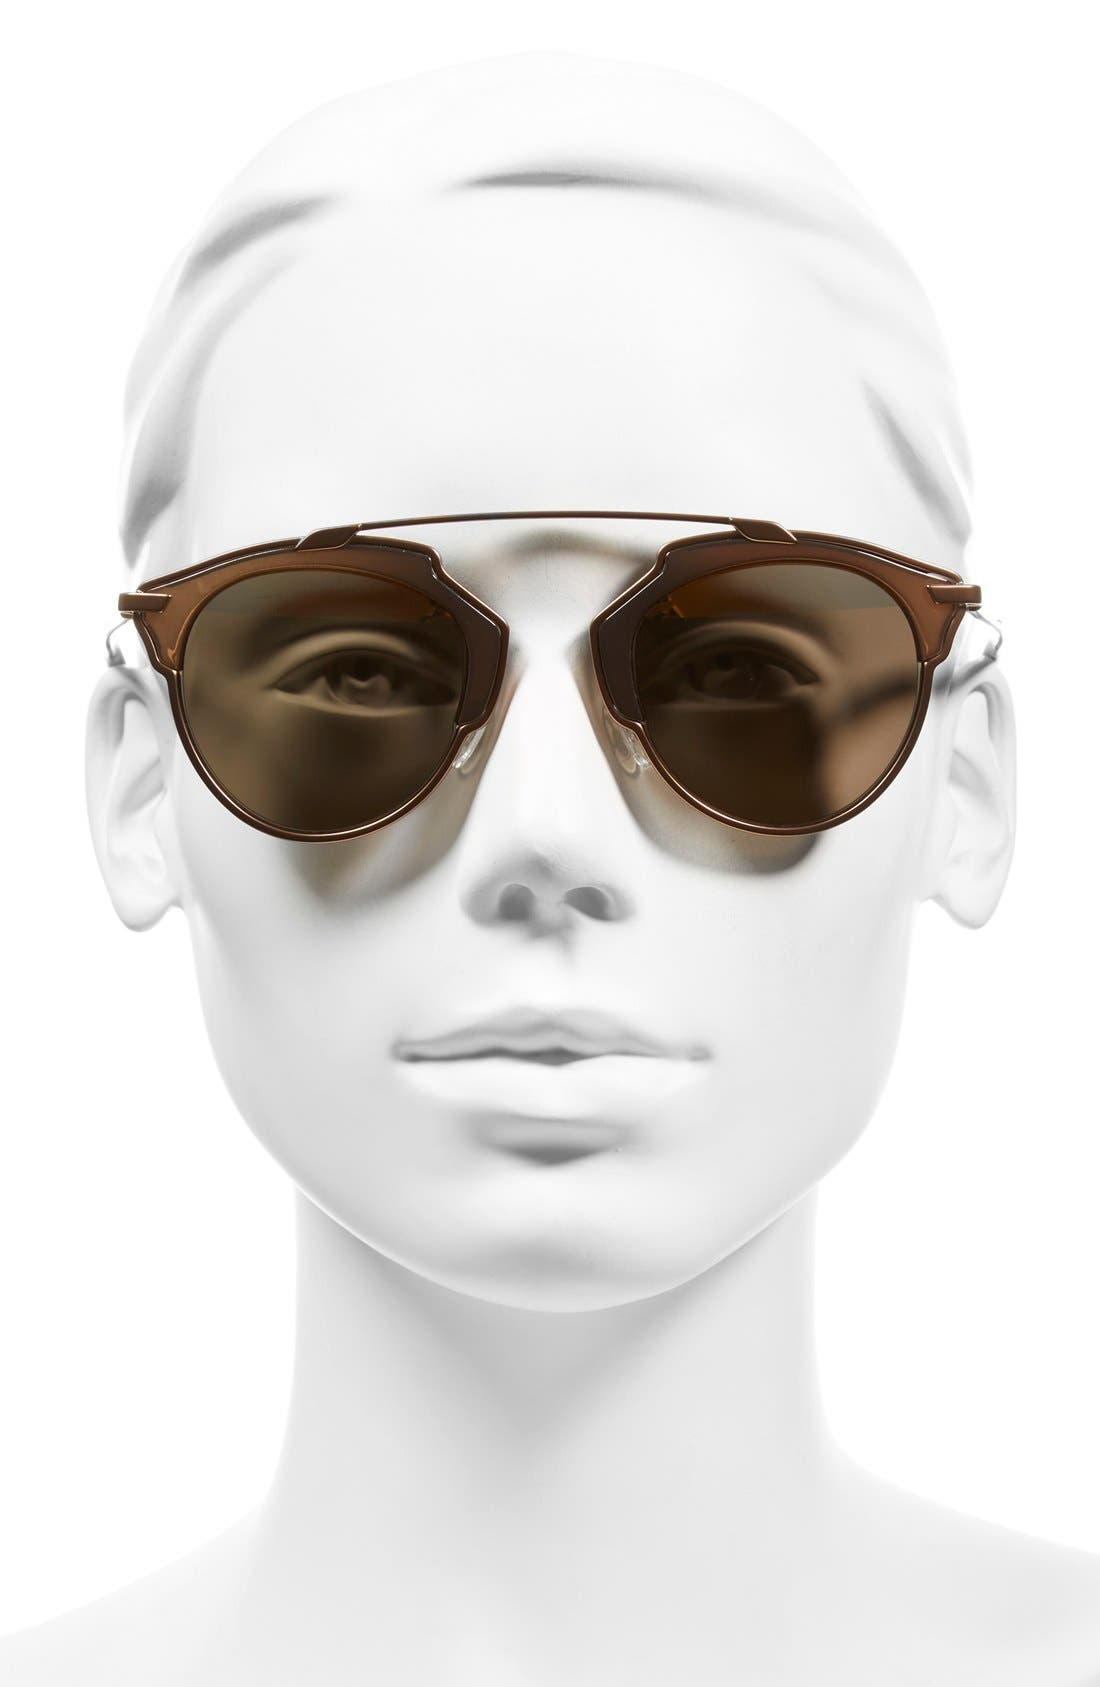 So Real 48mm Brow Bar Sunglasses,                             Alternate thumbnail 50, color,